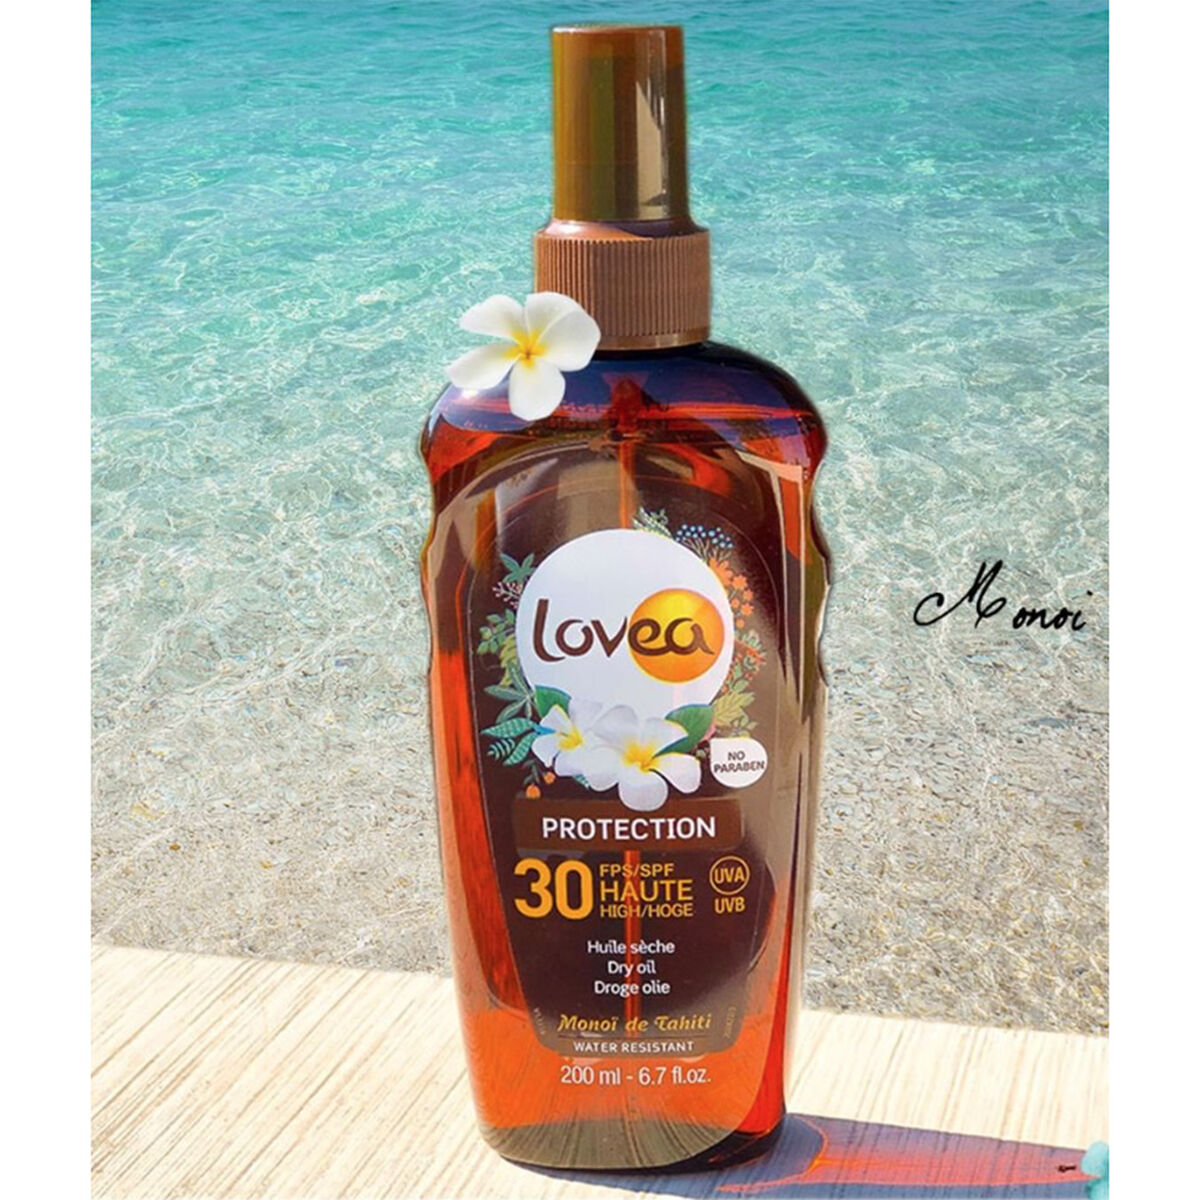 Spray Aceite Seco Alta Protección Monoï de Tahiti - SPF 30 - 200 ml